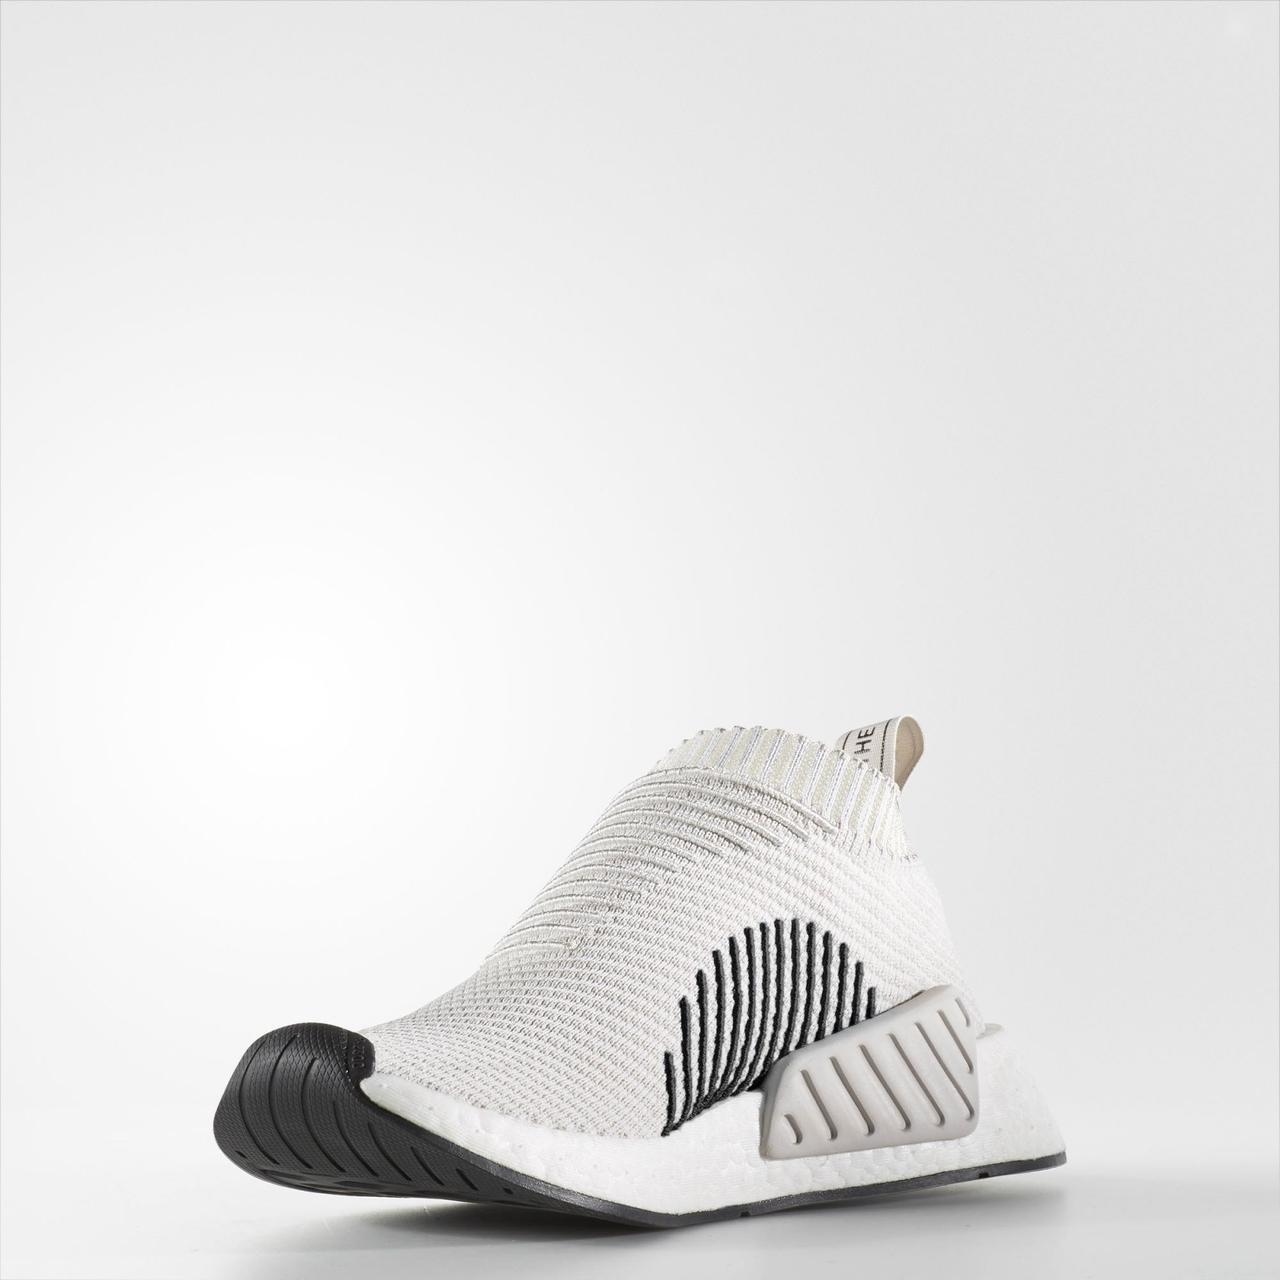 381324d5751b Женские кроссовки Adidas Originals NMD CS2 Primeknit (Артикул  BA7213) -  Адидас официальный интернет -